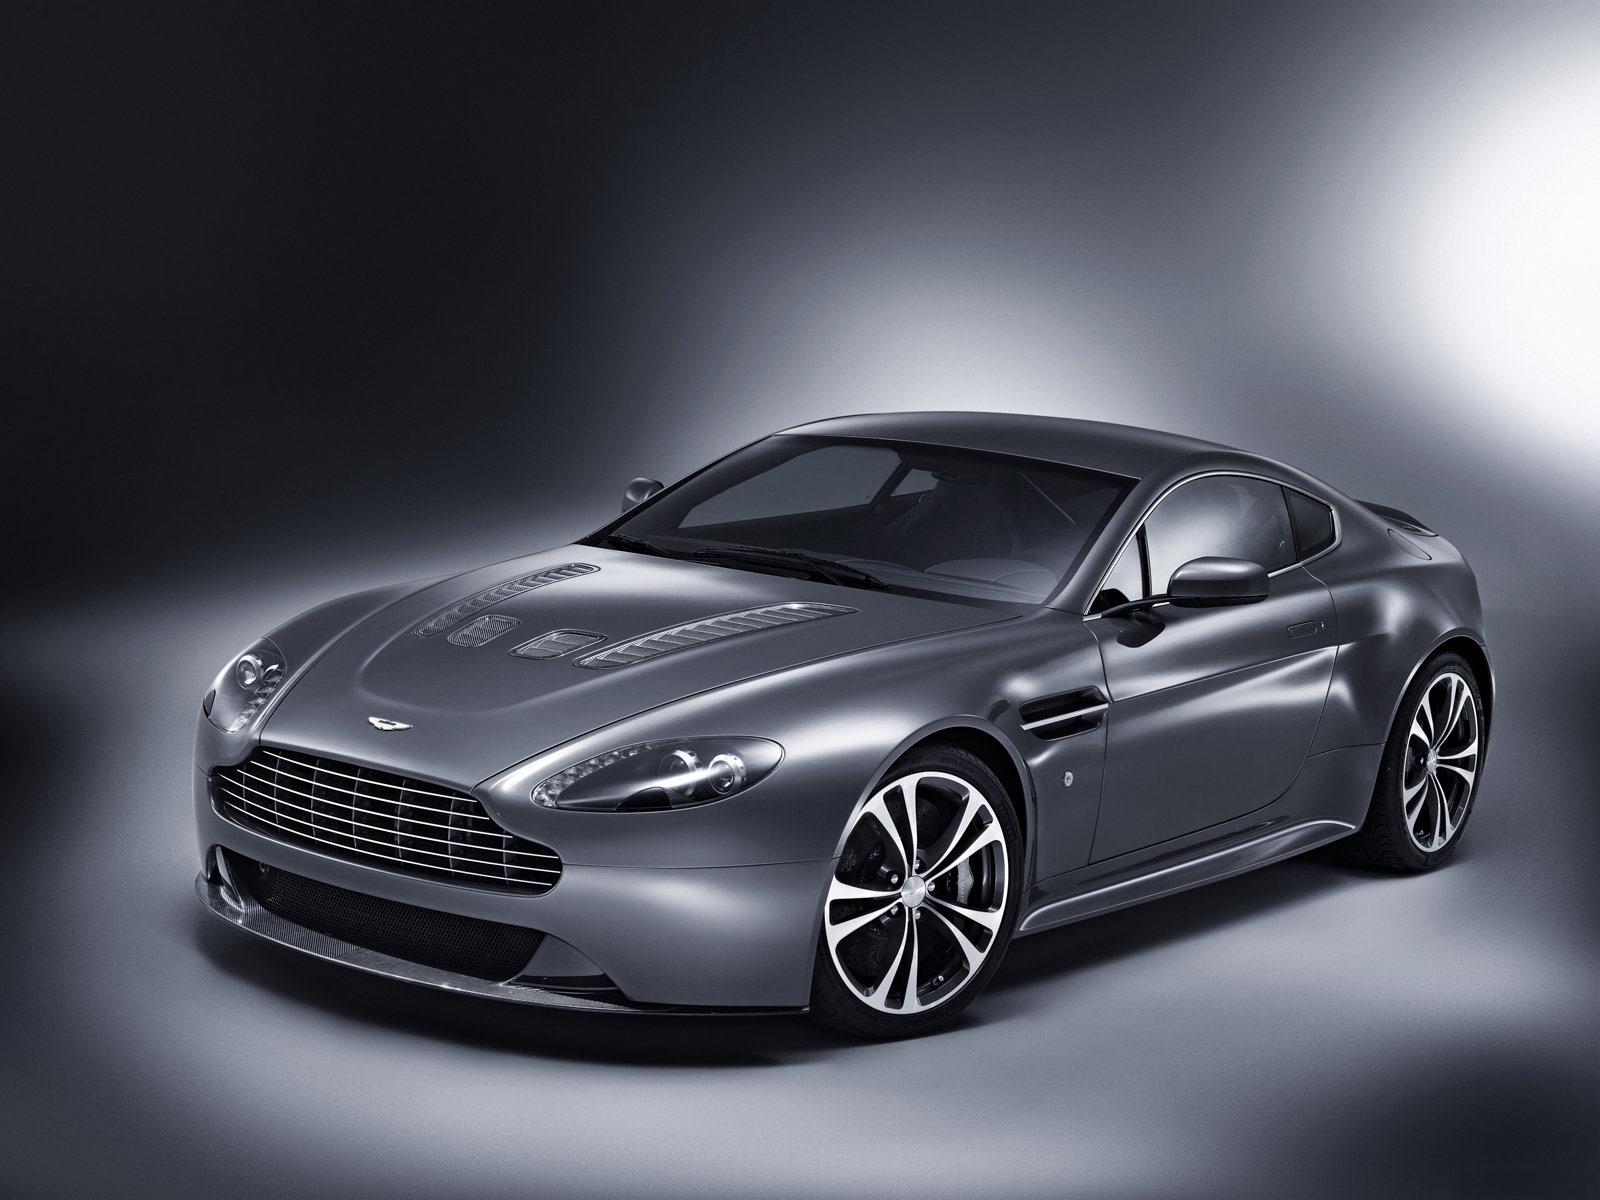 Car Photos Specs Dealers Auto Accident Lawyers Insurance Gambar Mobil Aston Martin V12 Vantage 2010